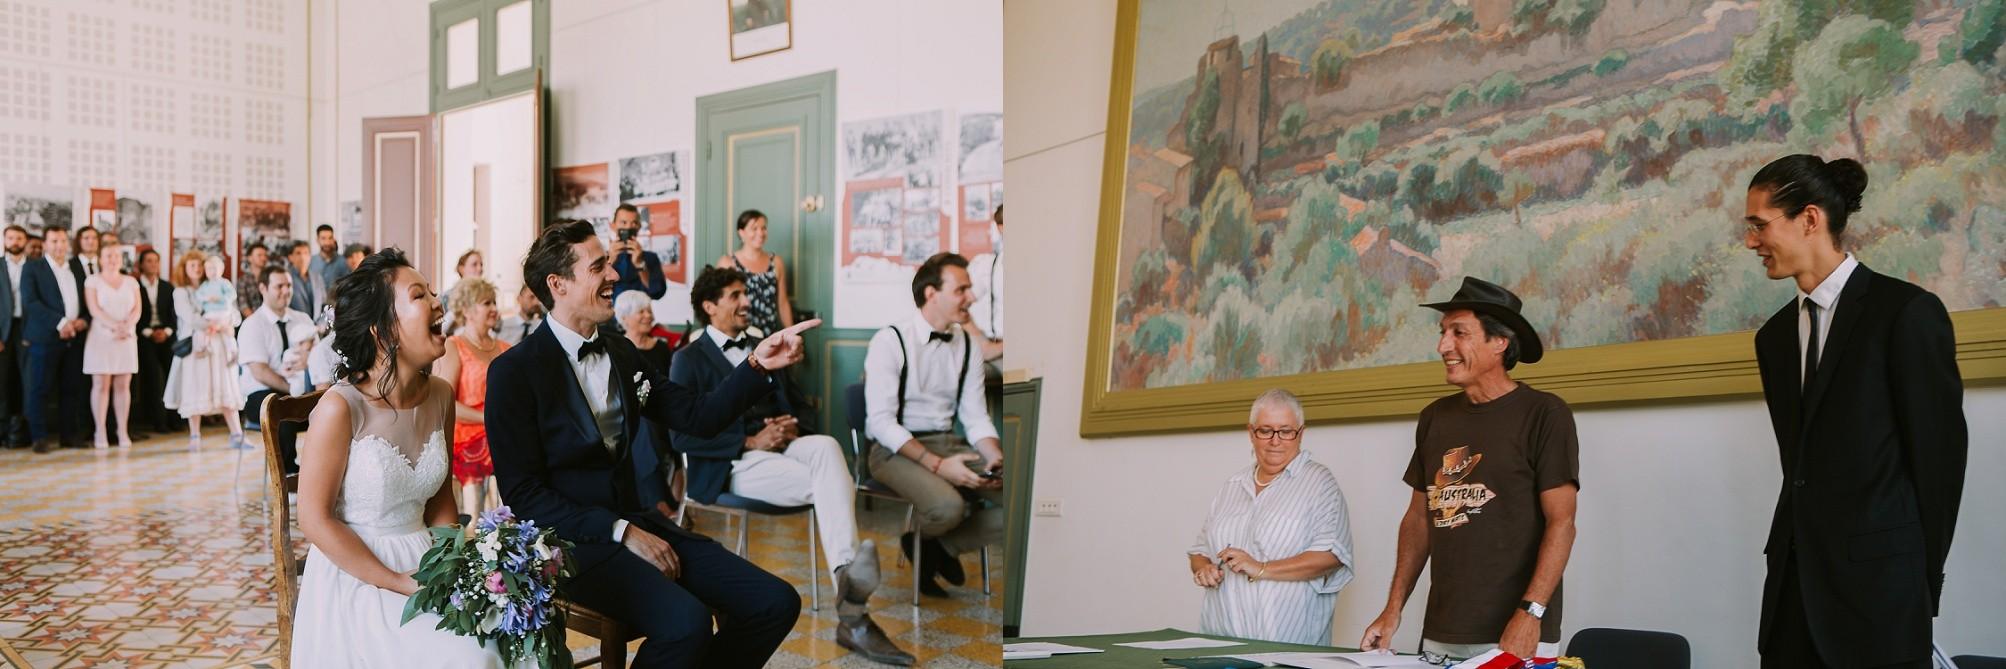 katerynaphotos-mariage-photographe-puyloubier-provence-aix-en-provence-sud-de-la-france_0360.jpg